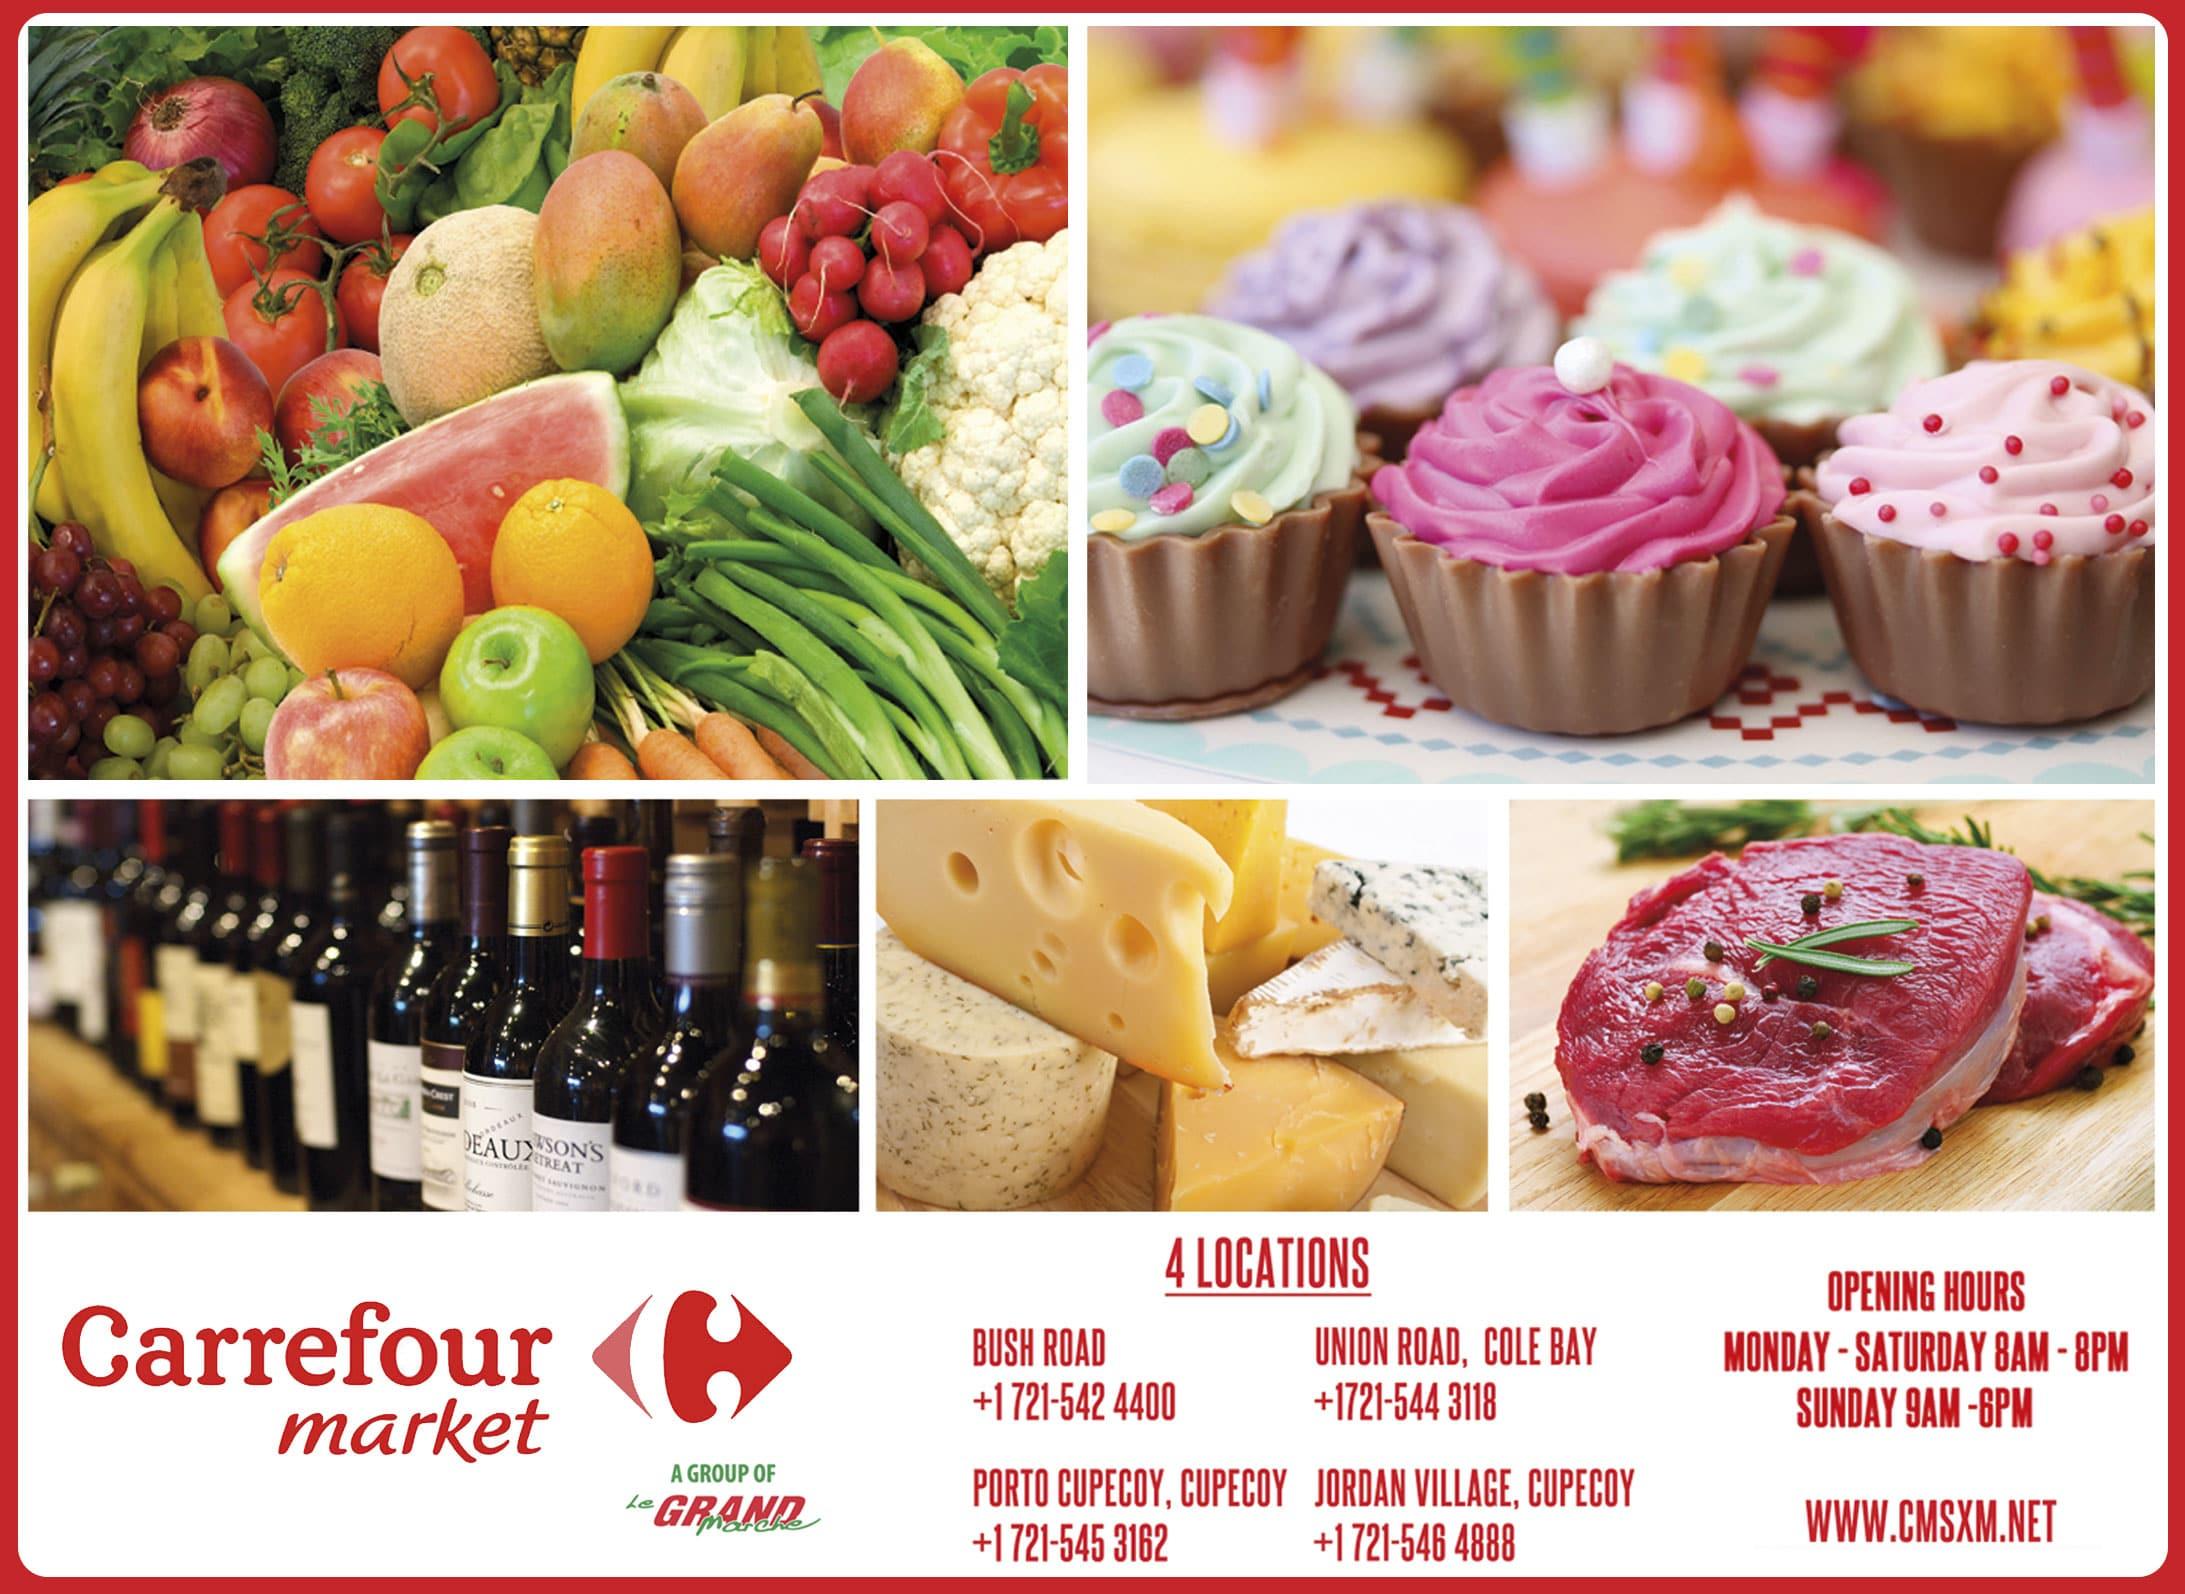 St Maarten Telephone Directory - Carrefour Market